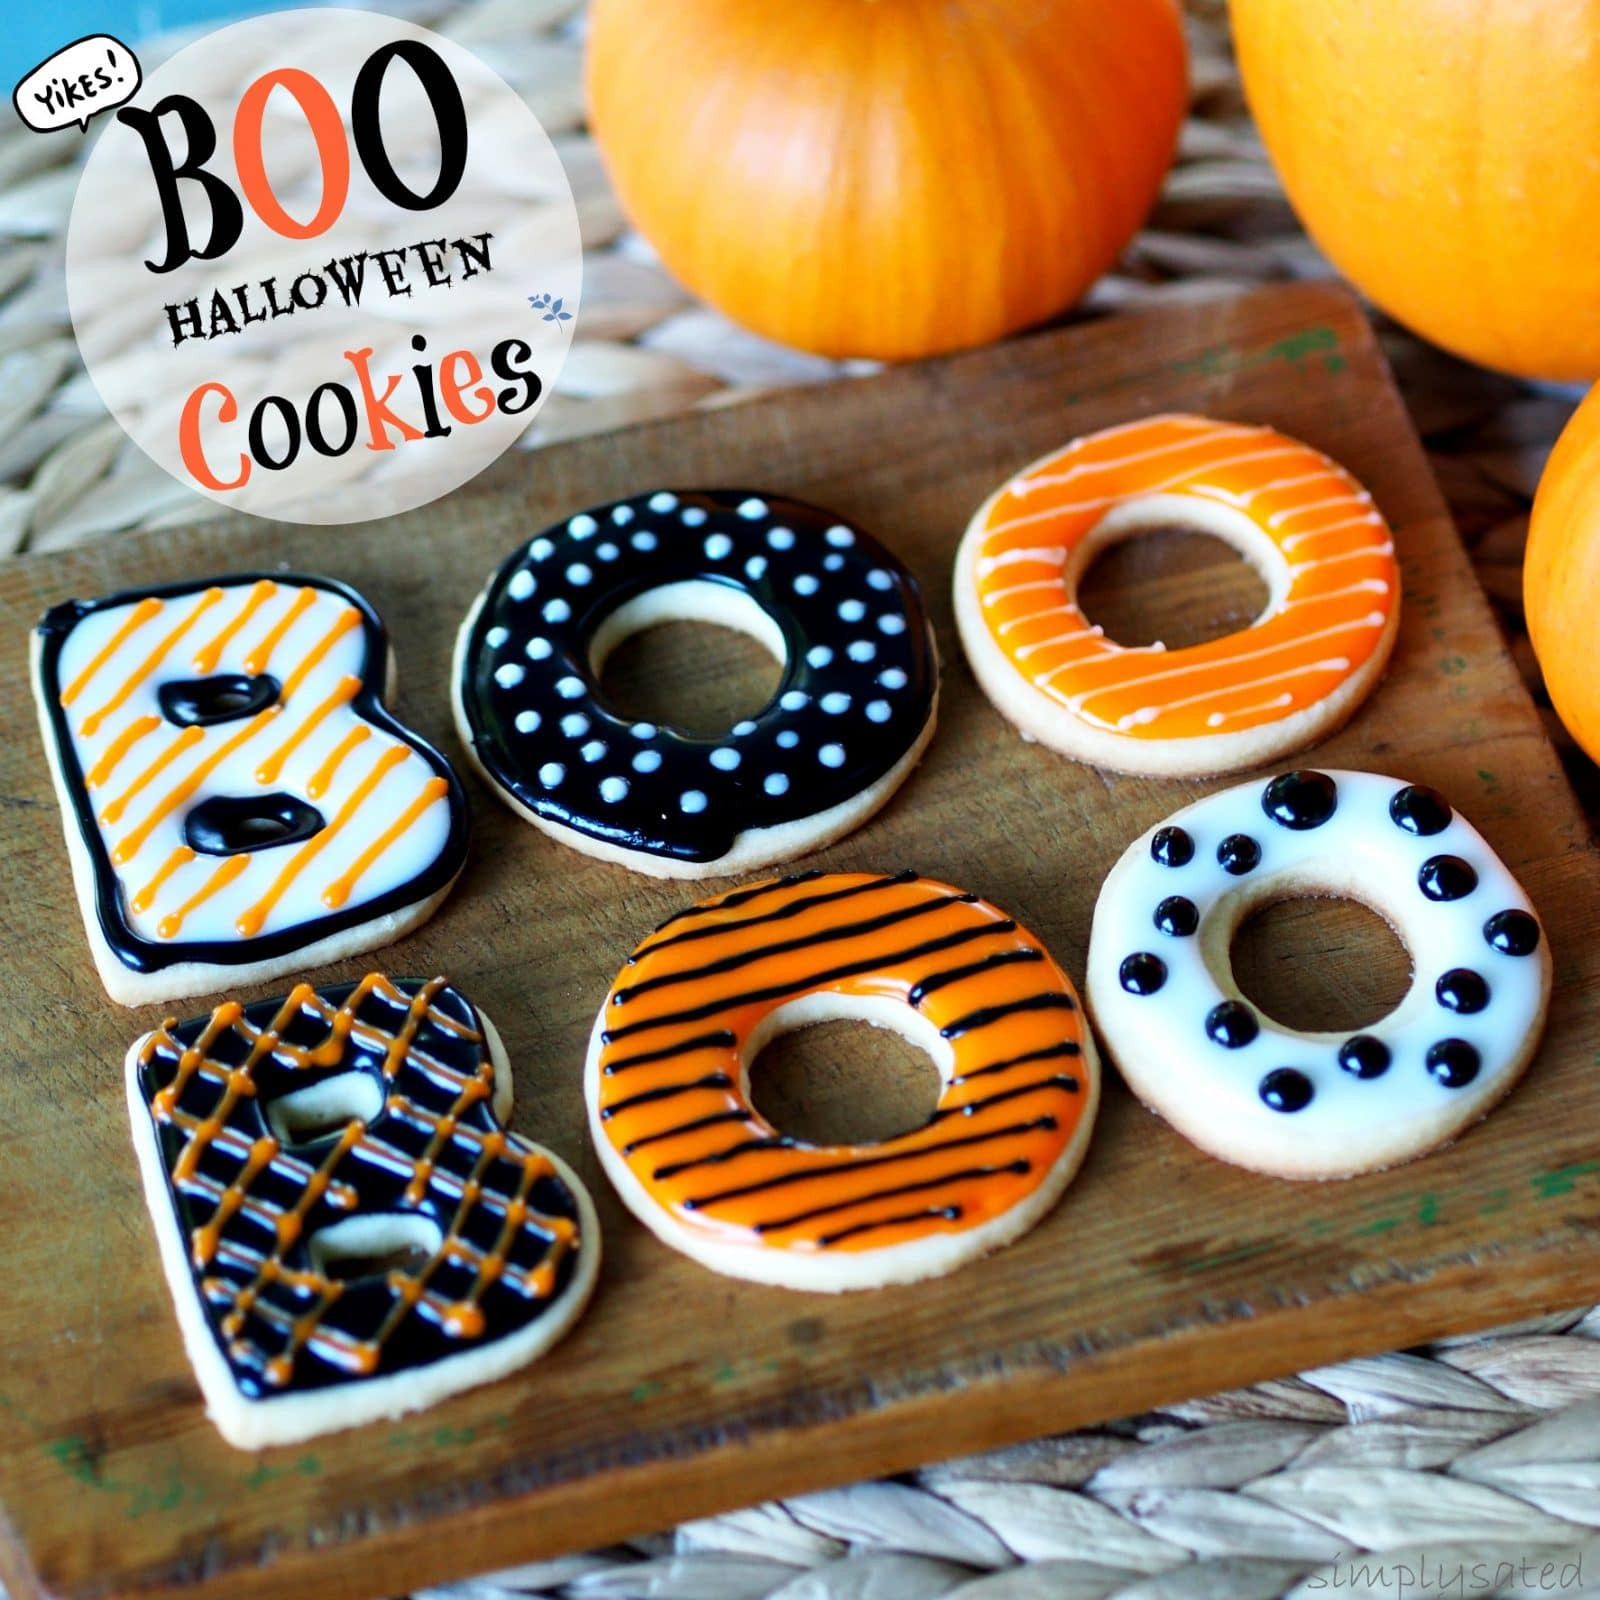 Halloween Cakes At Walmart  BOO Halloween Cookies